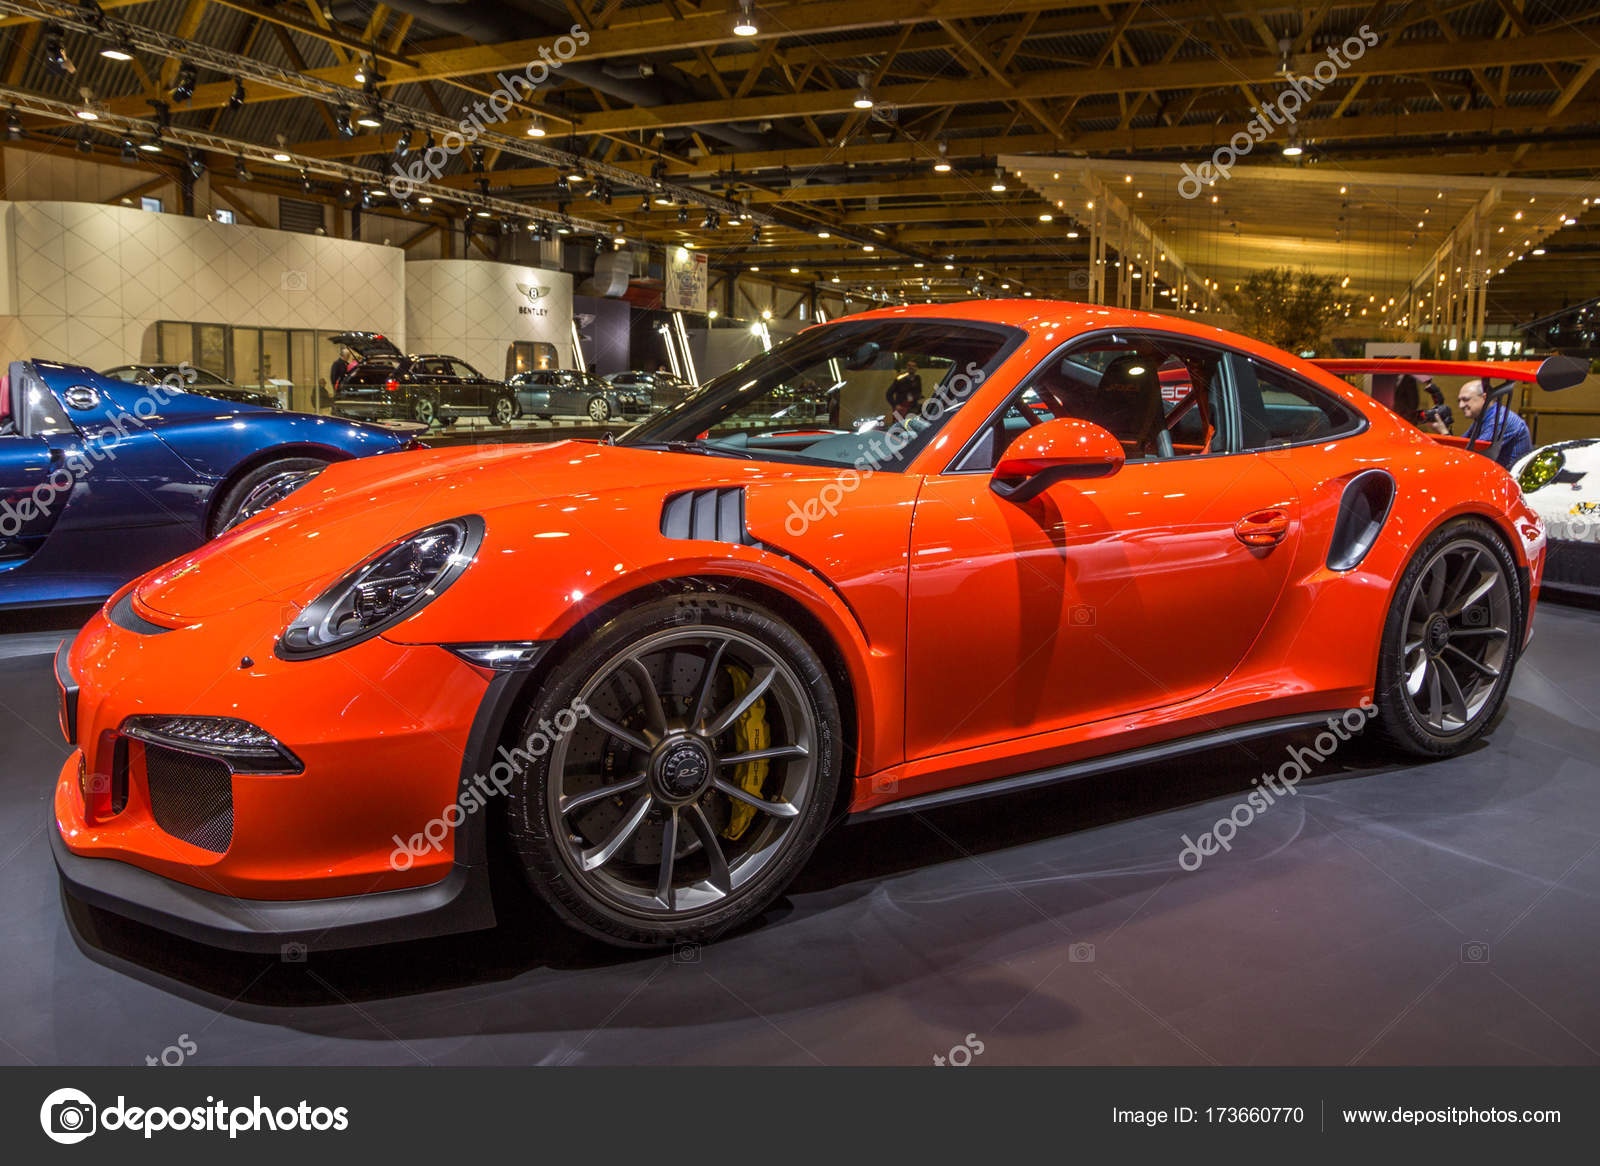 porsche 911 gt3 rs sportwagen redaktionelles stockfoto foto vdw 173660770. Black Bedroom Furniture Sets. Home Design Ideas